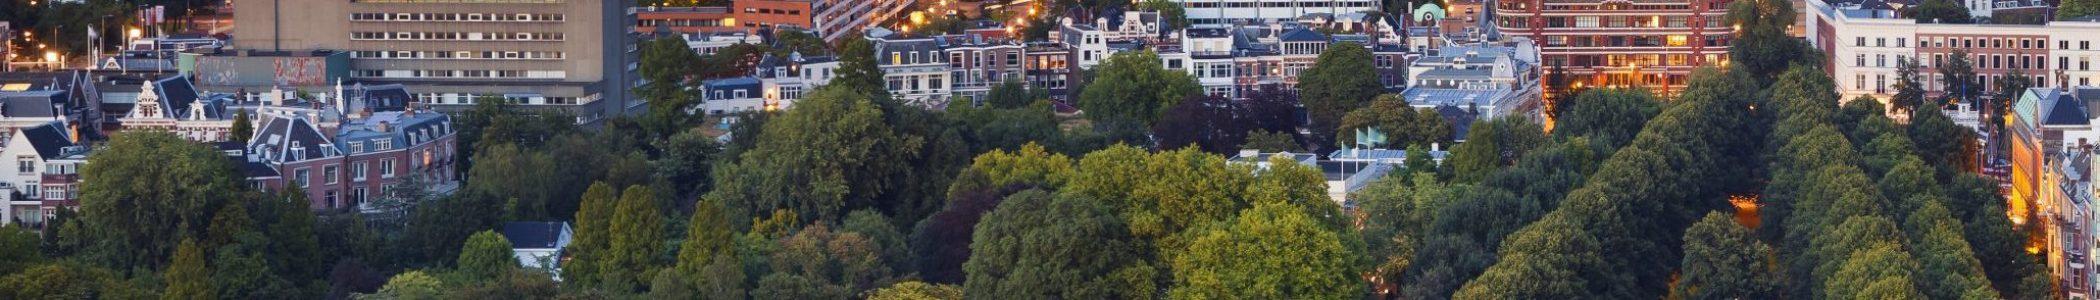 Rotrip | Private Equity | Investeringen - Rotterdam